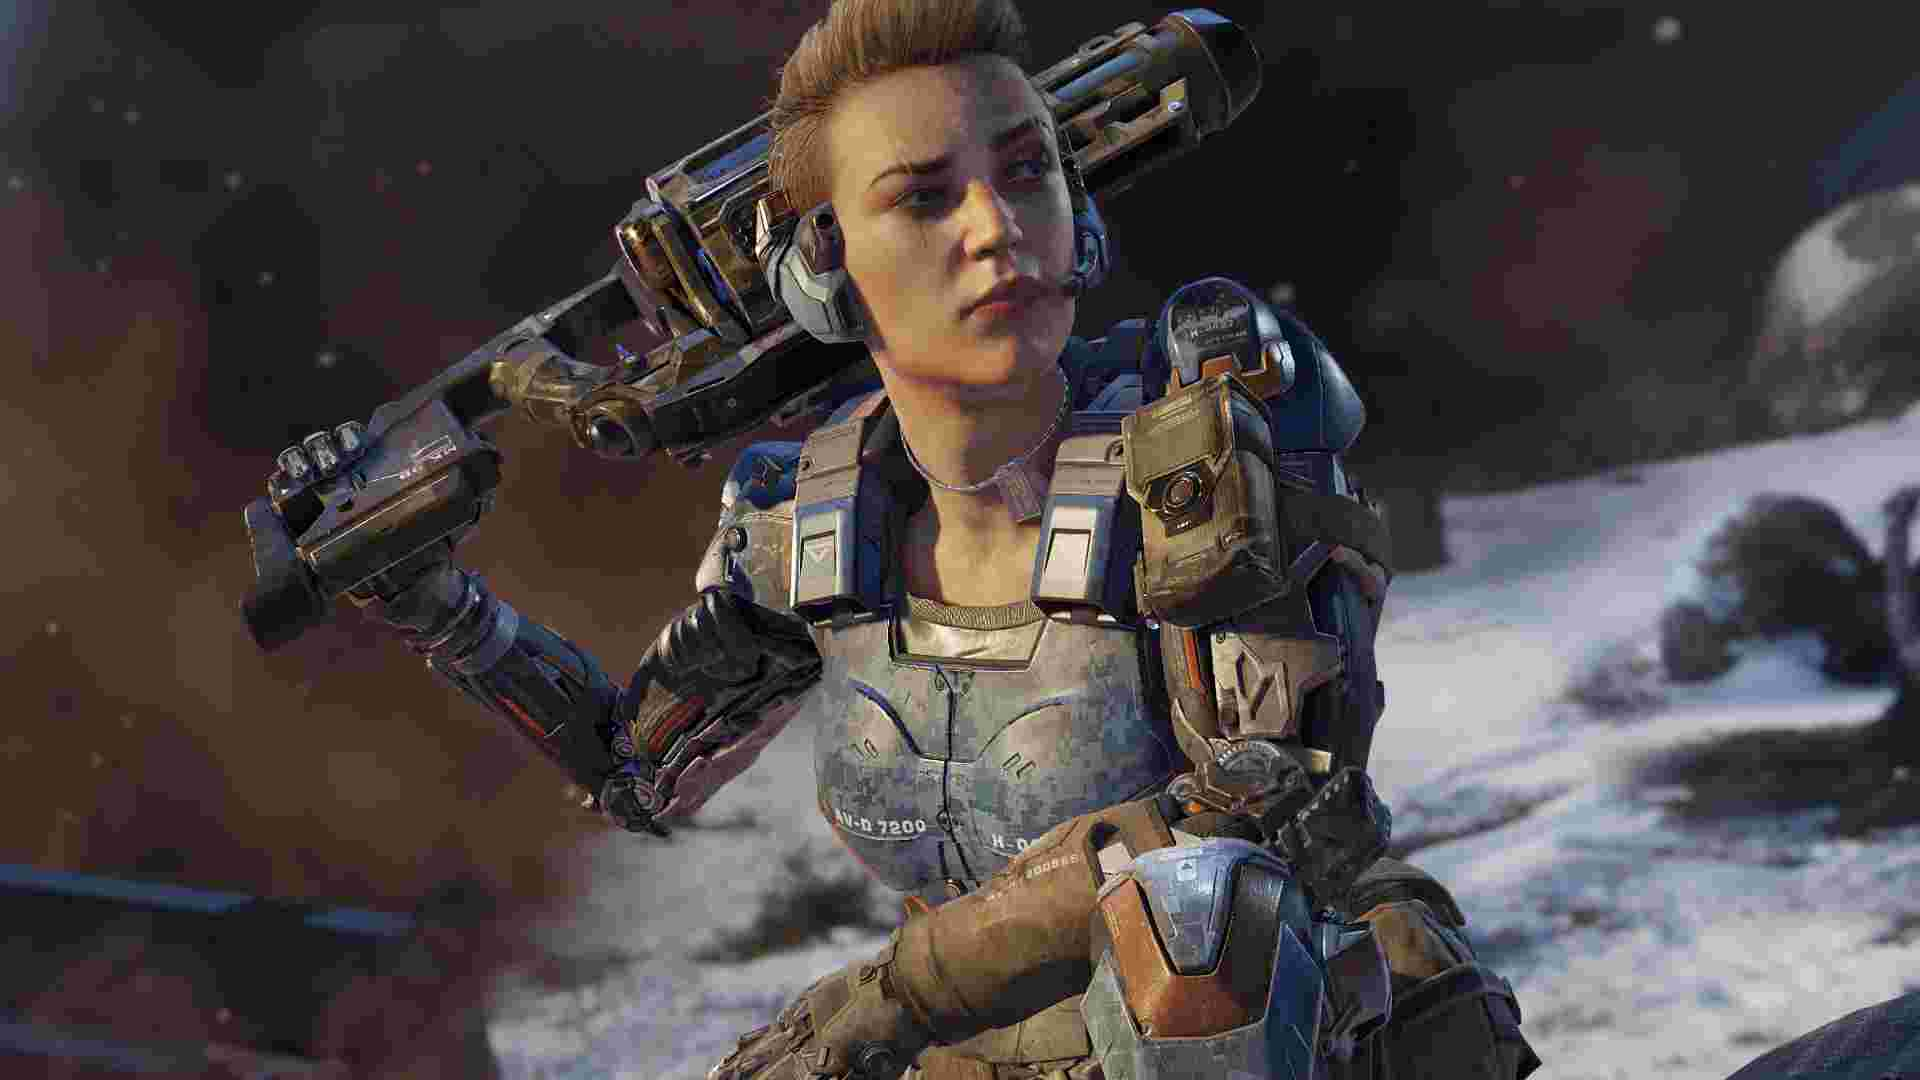 Ув очікуванні Call of Duty: Black Ops III | Прев'ю